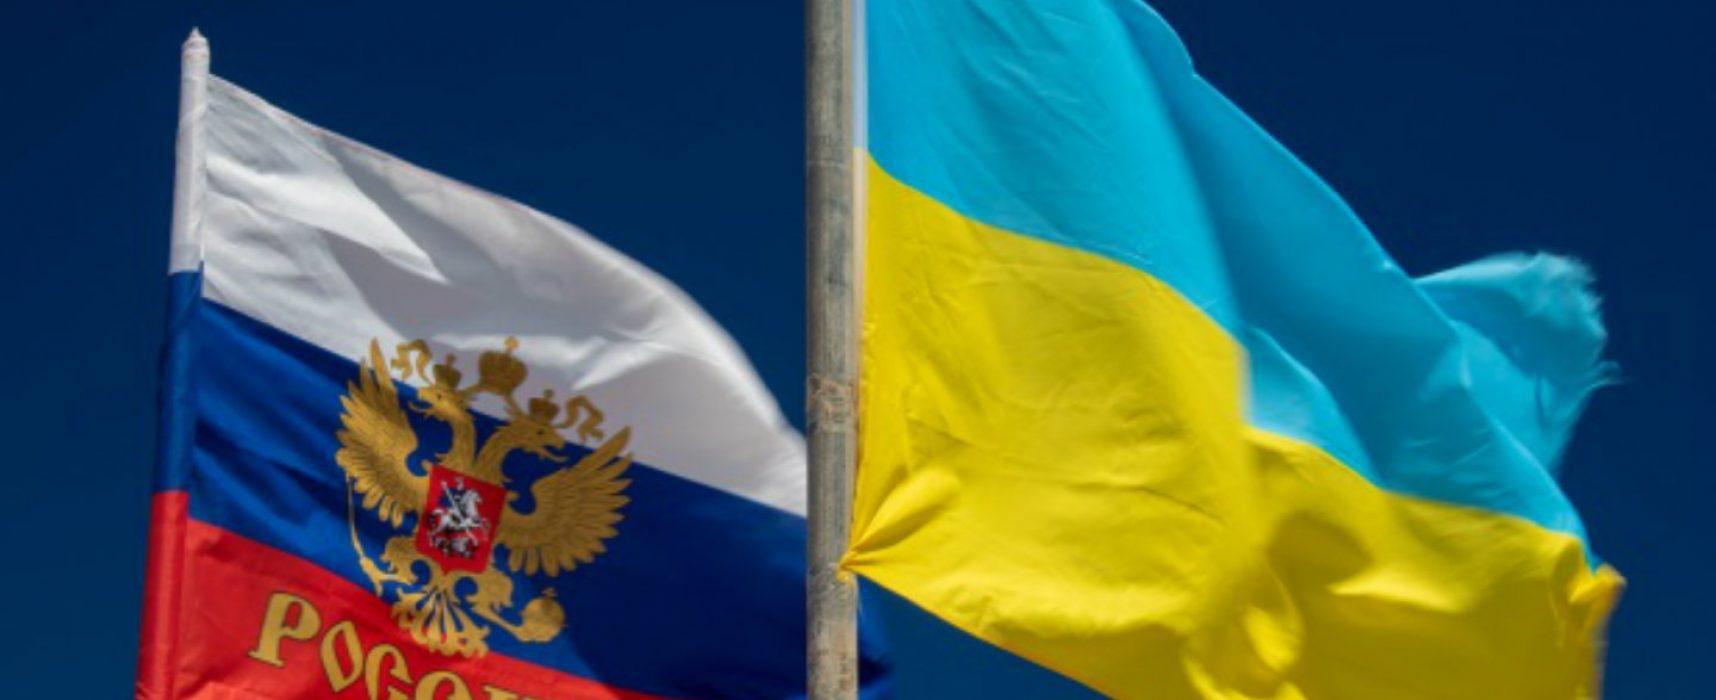 Weaponizing language to discredit the Ukrainian elections